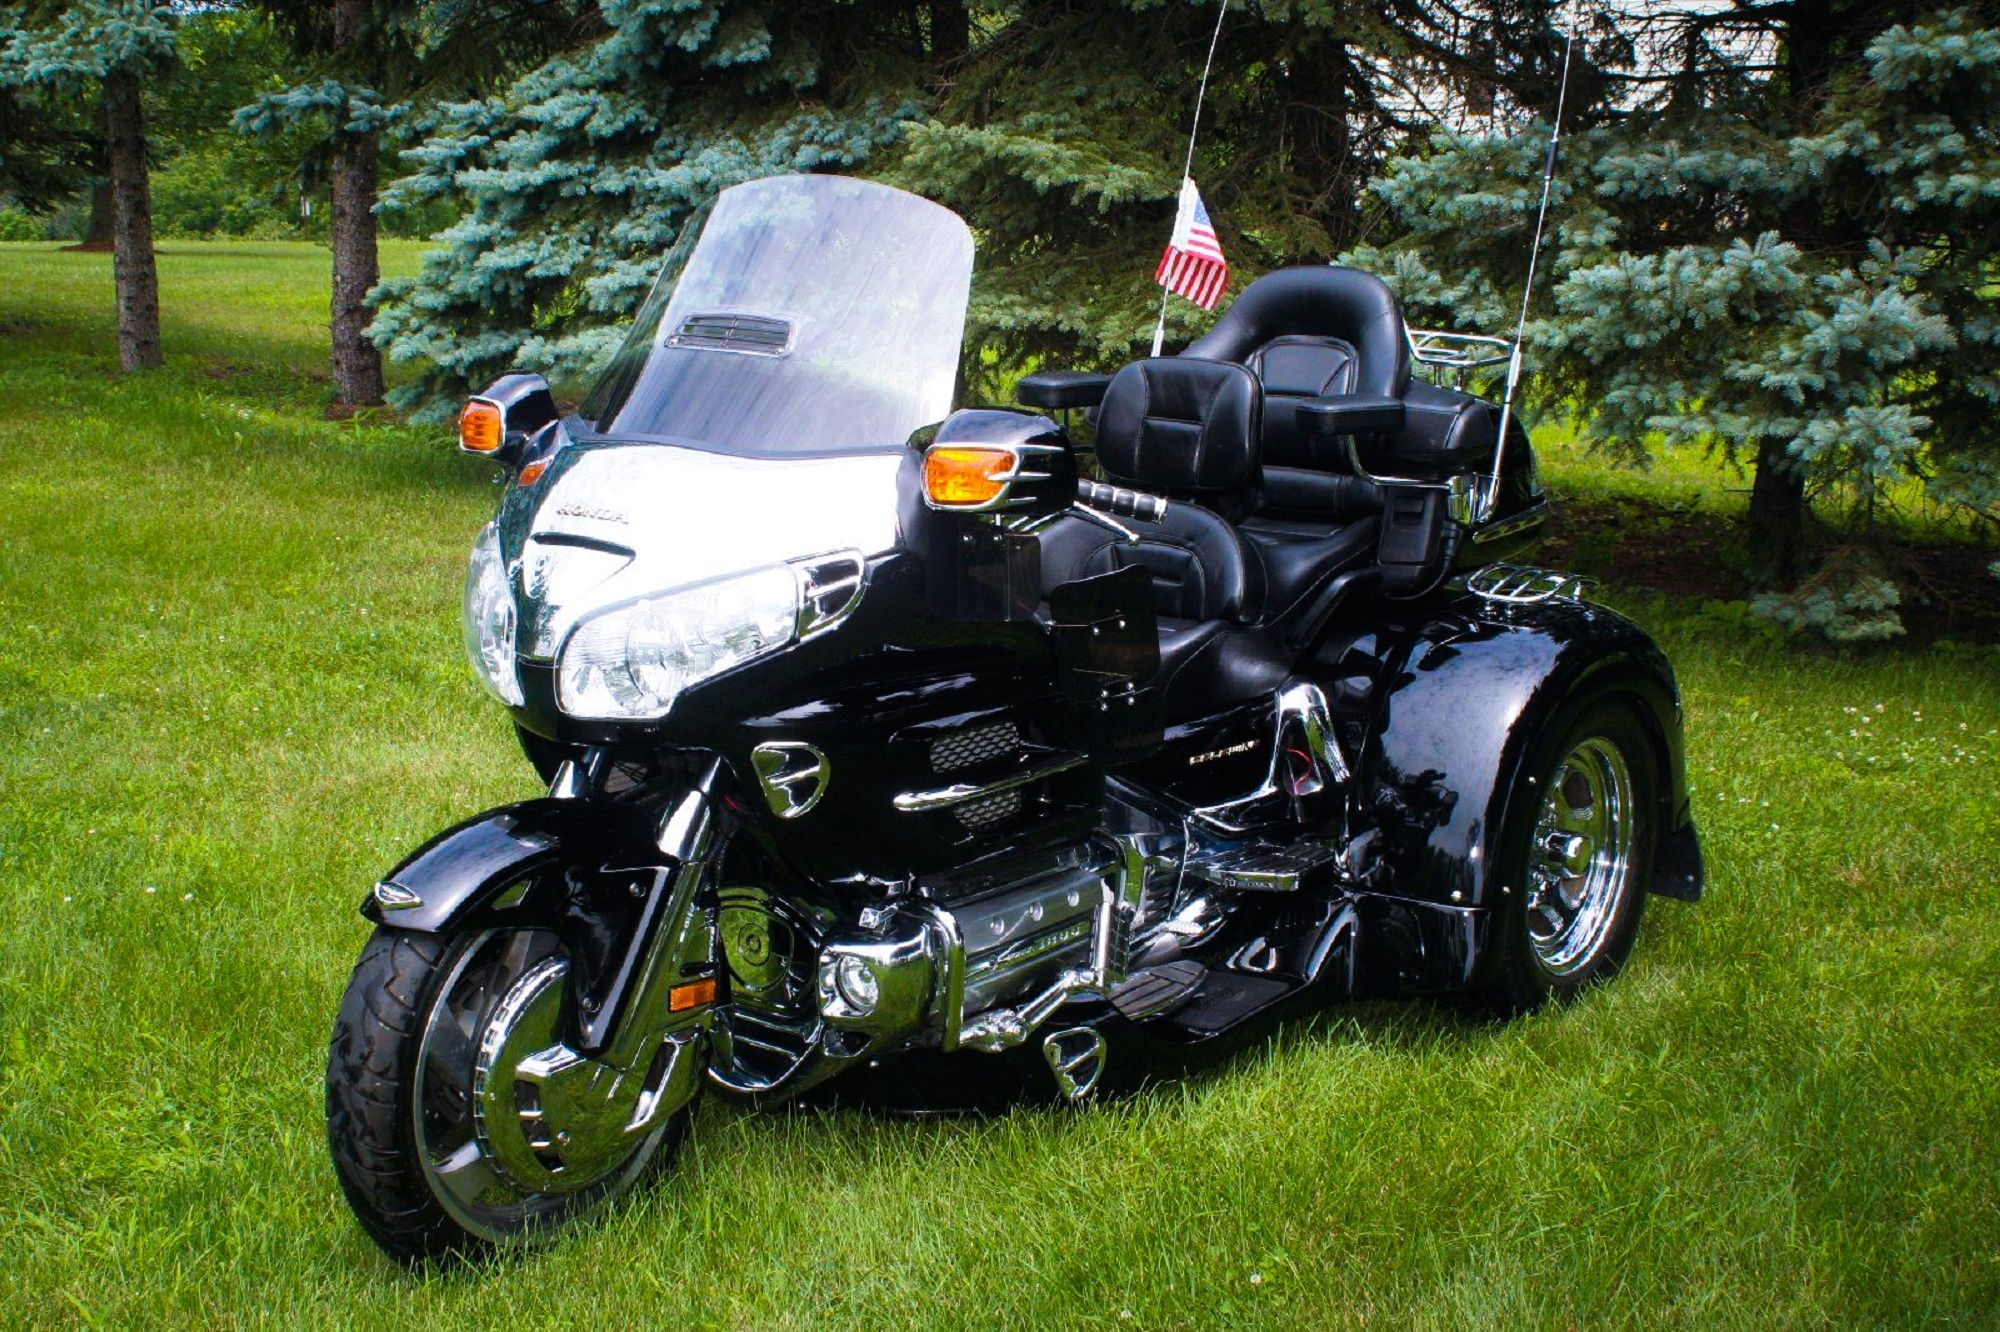 2001 Honda GoldWing GL1800 Trike. http://www.ebay.com/